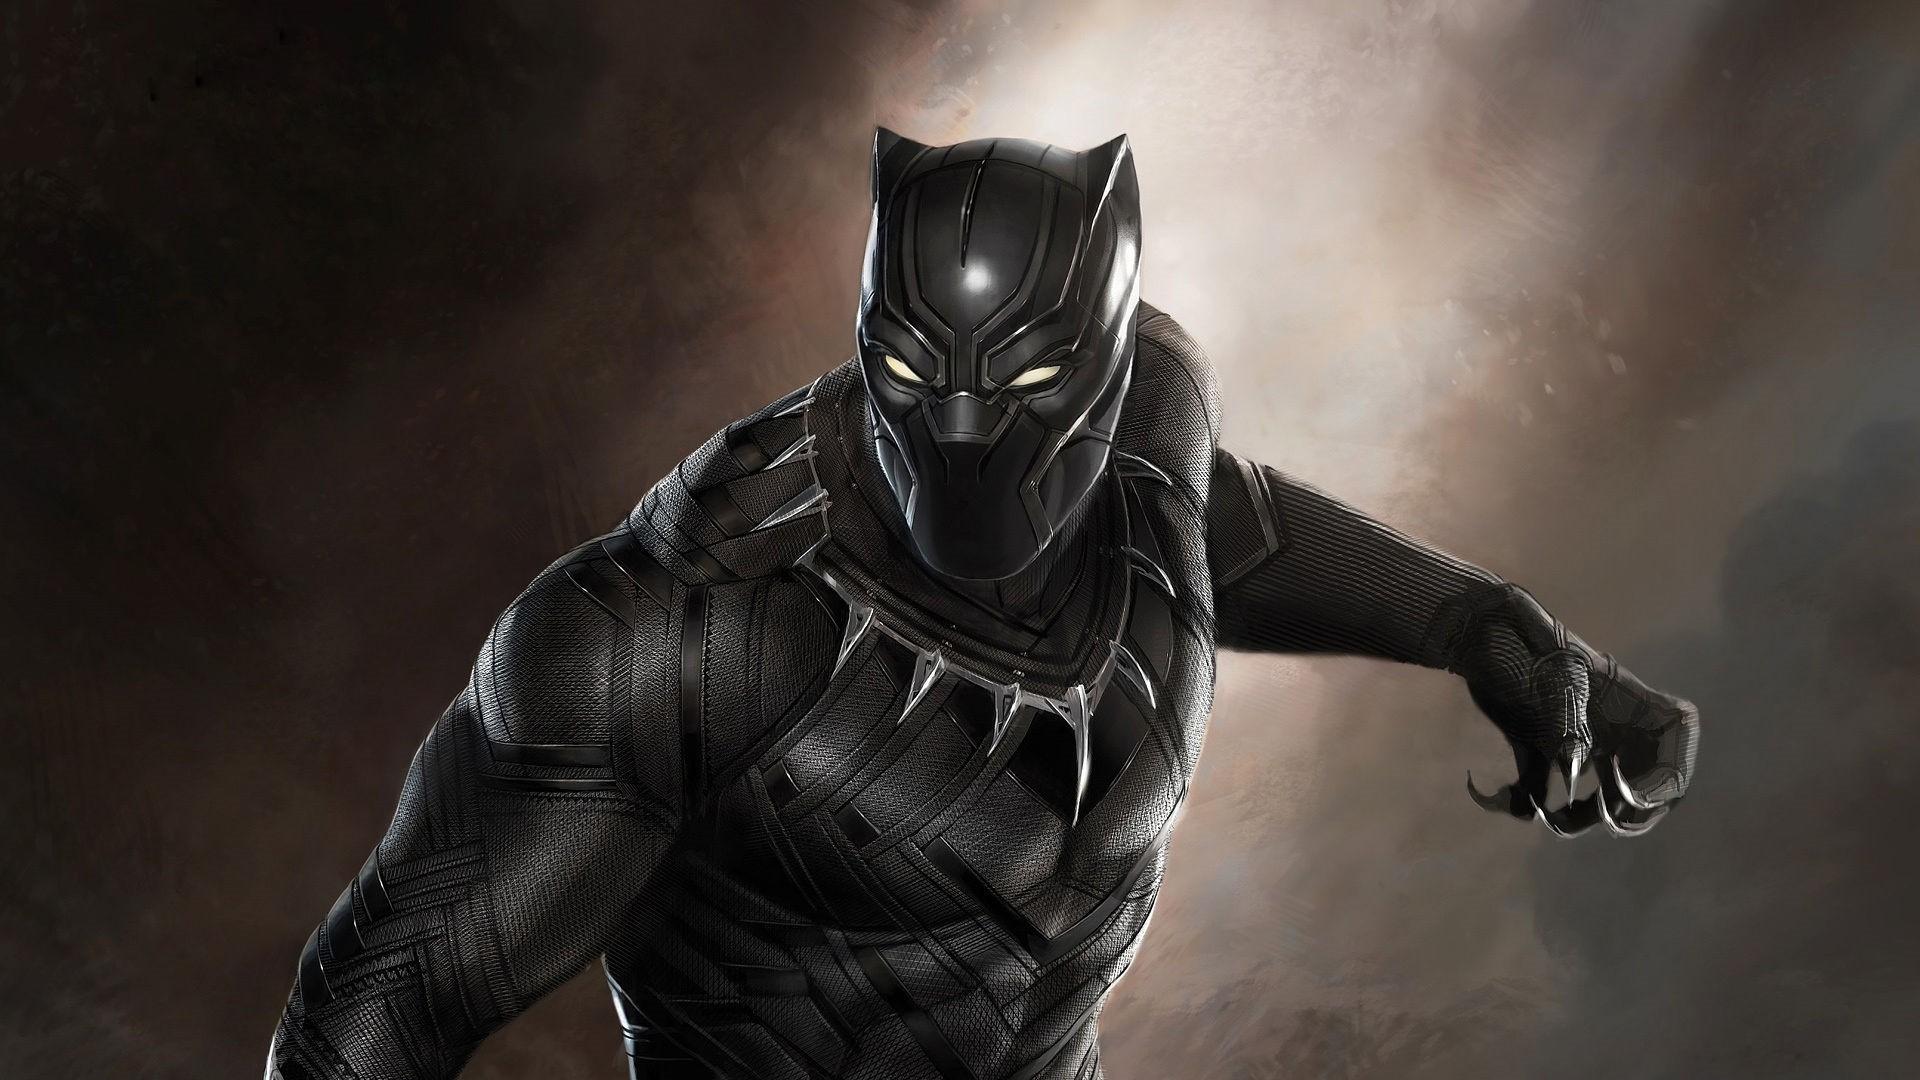 Black Panther computer wallpaper